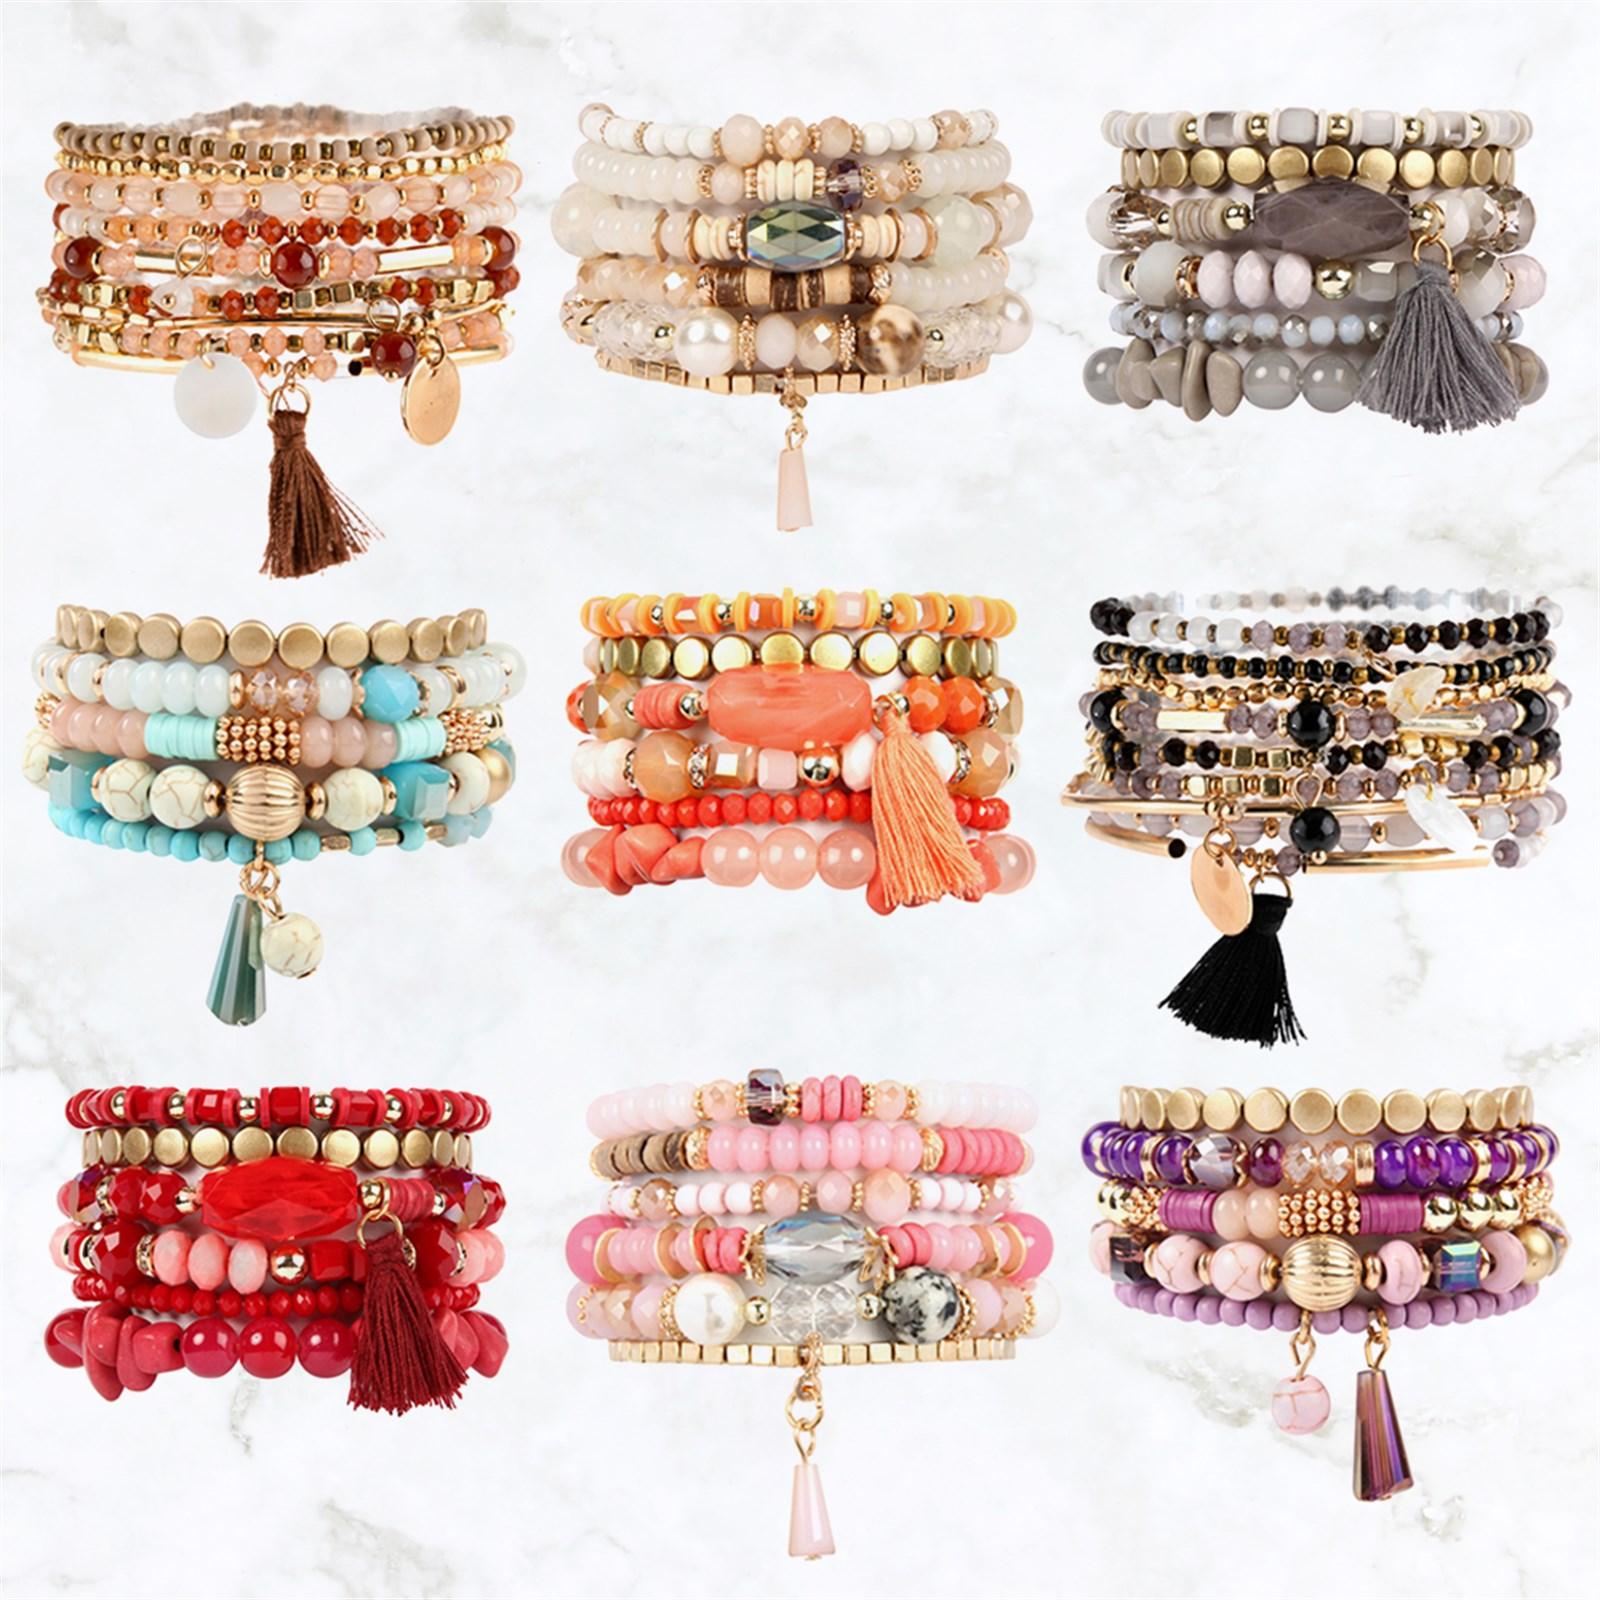 Charm Pendant Bracelets $7.99 Shipped